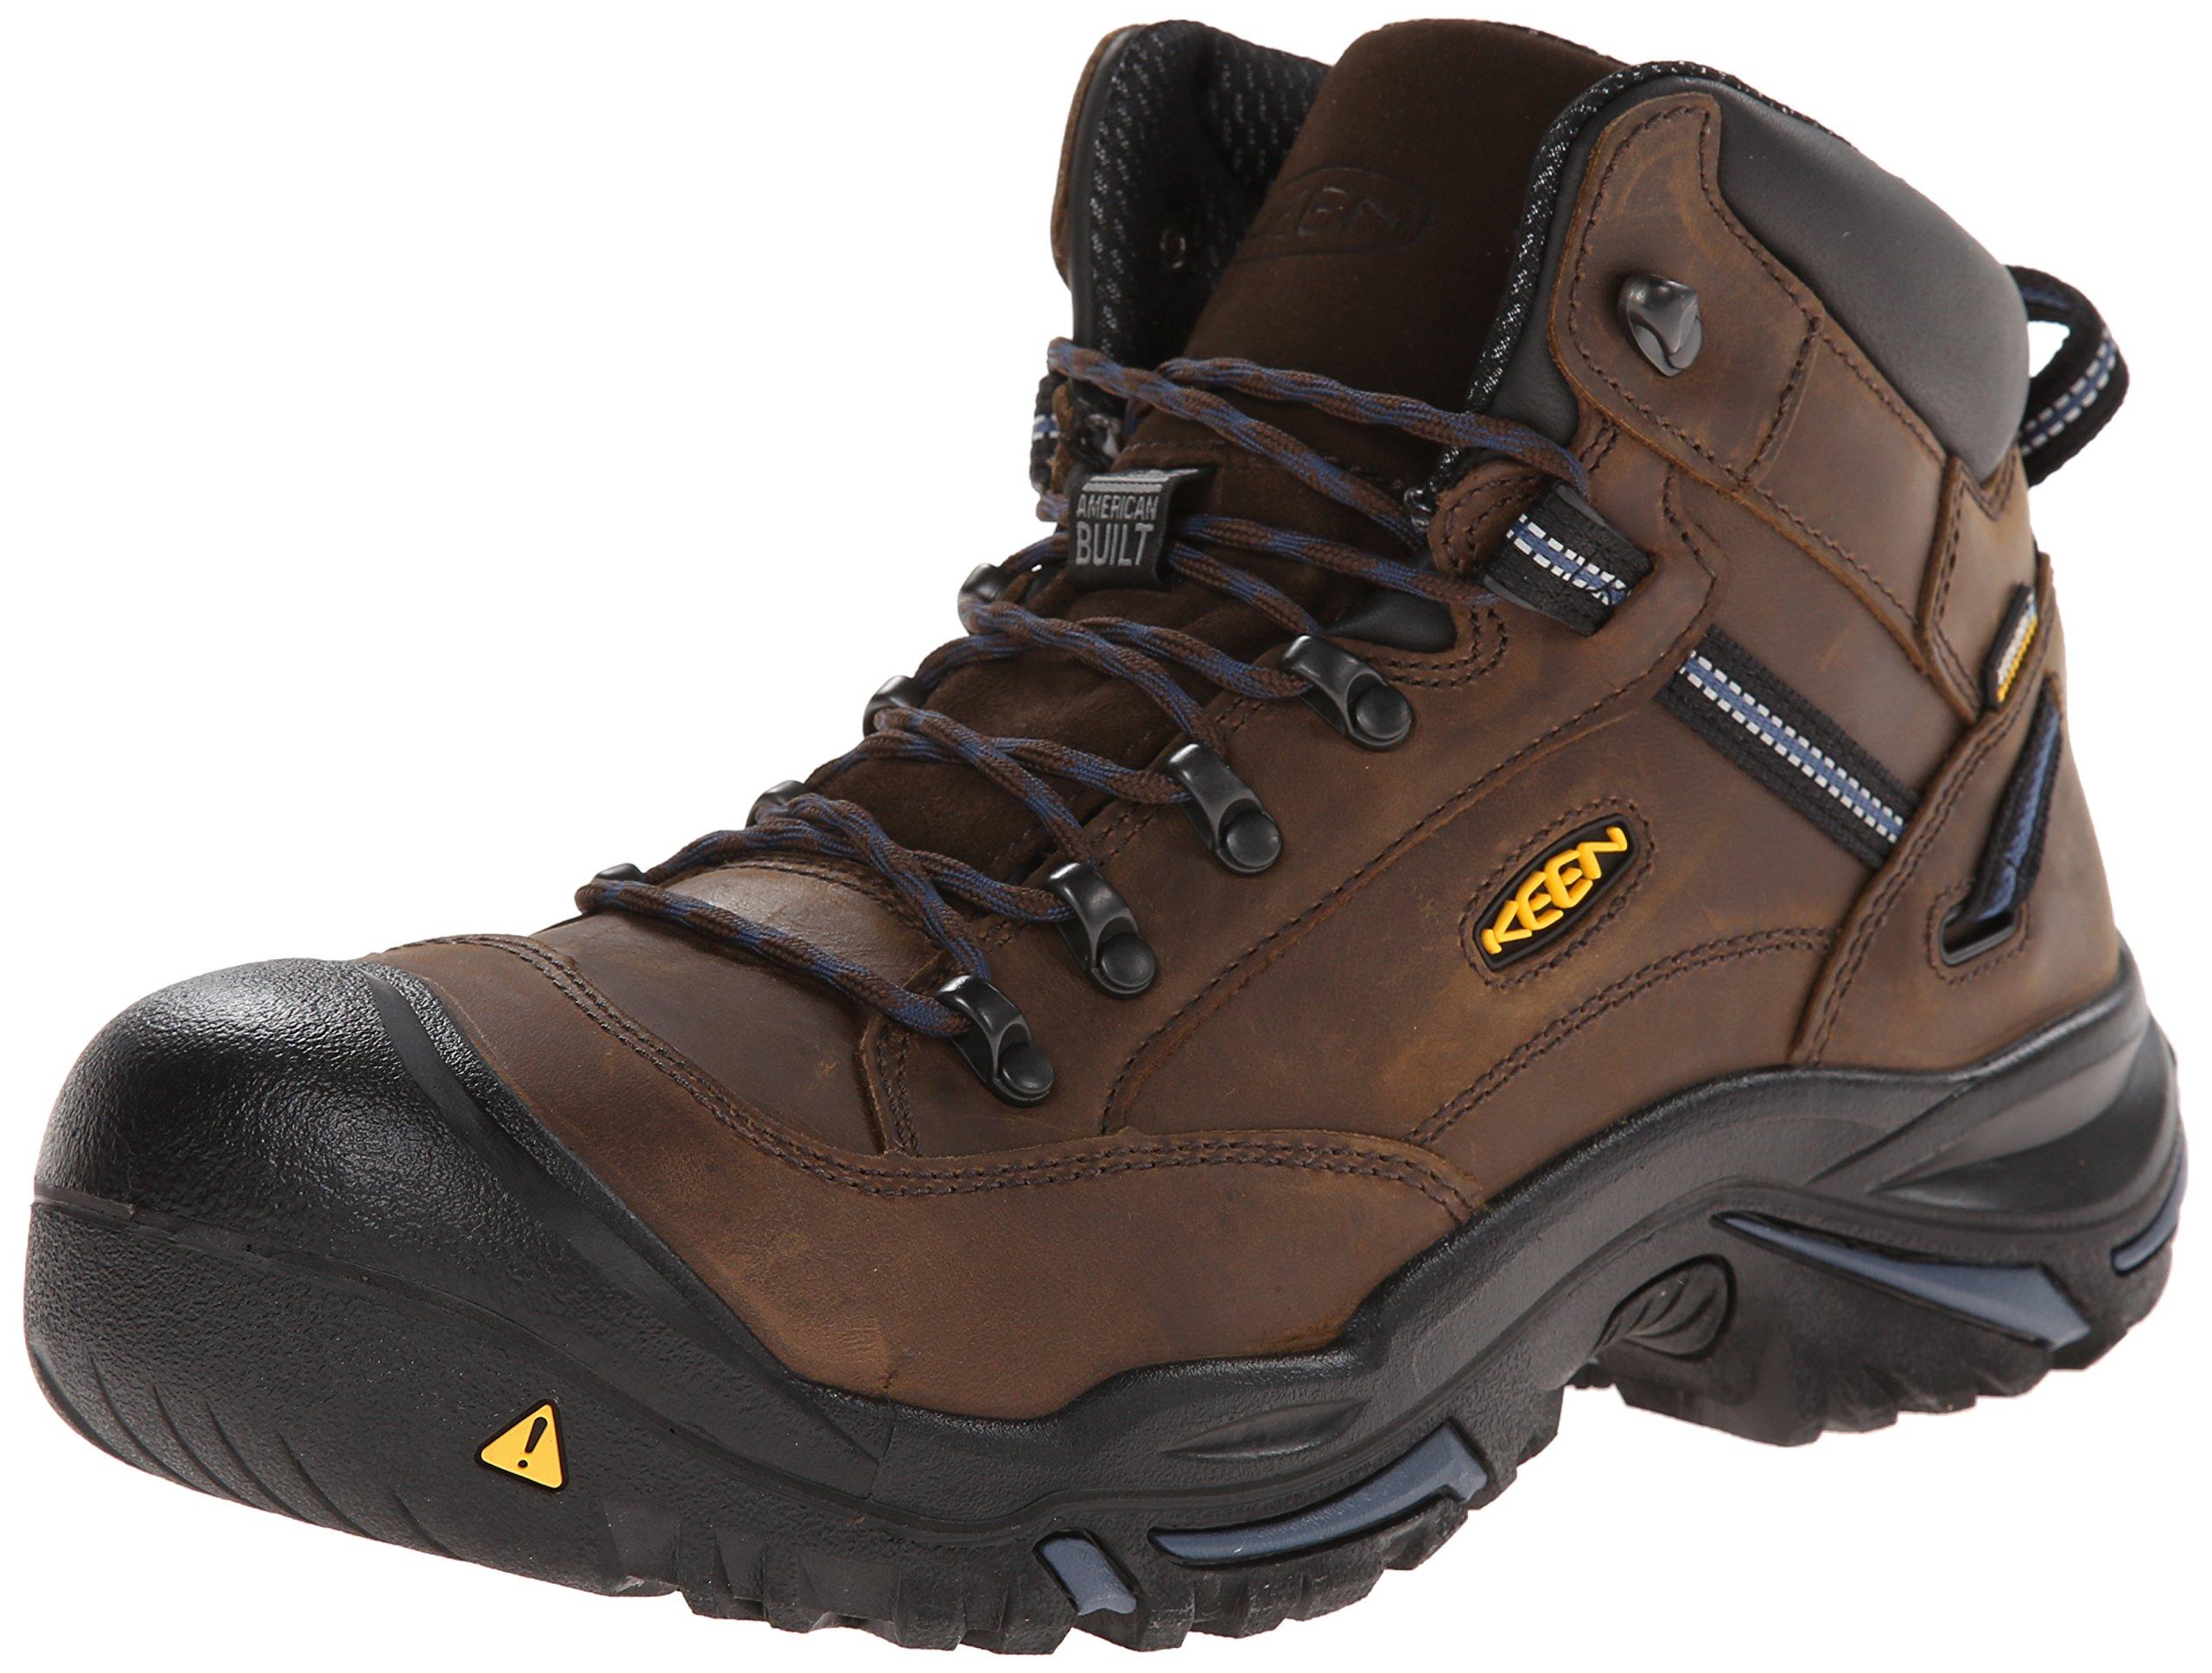 Keen Utility Men's Braddock Mid AL Waterproof M Work Boot, Bison/Ensign Blue, 10 D US